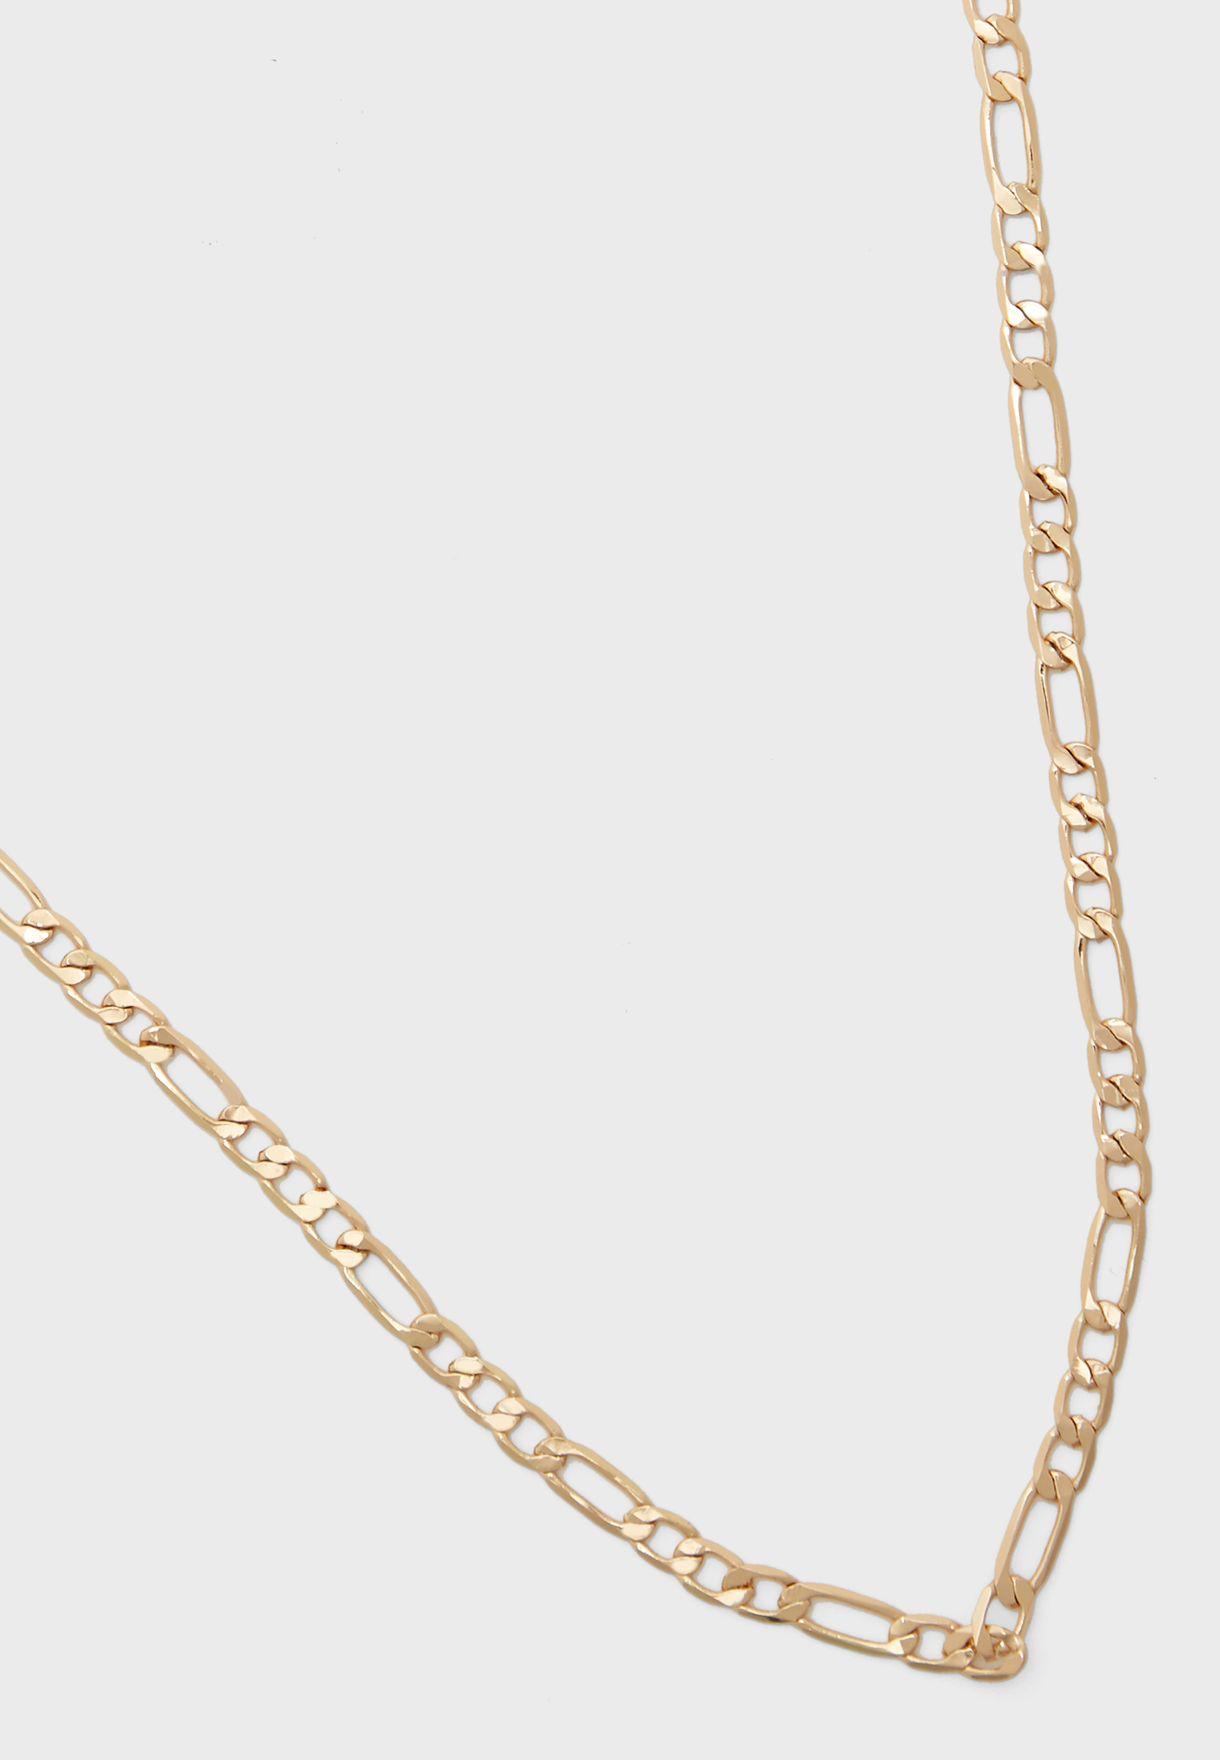 Meyendorff Layered Necklace